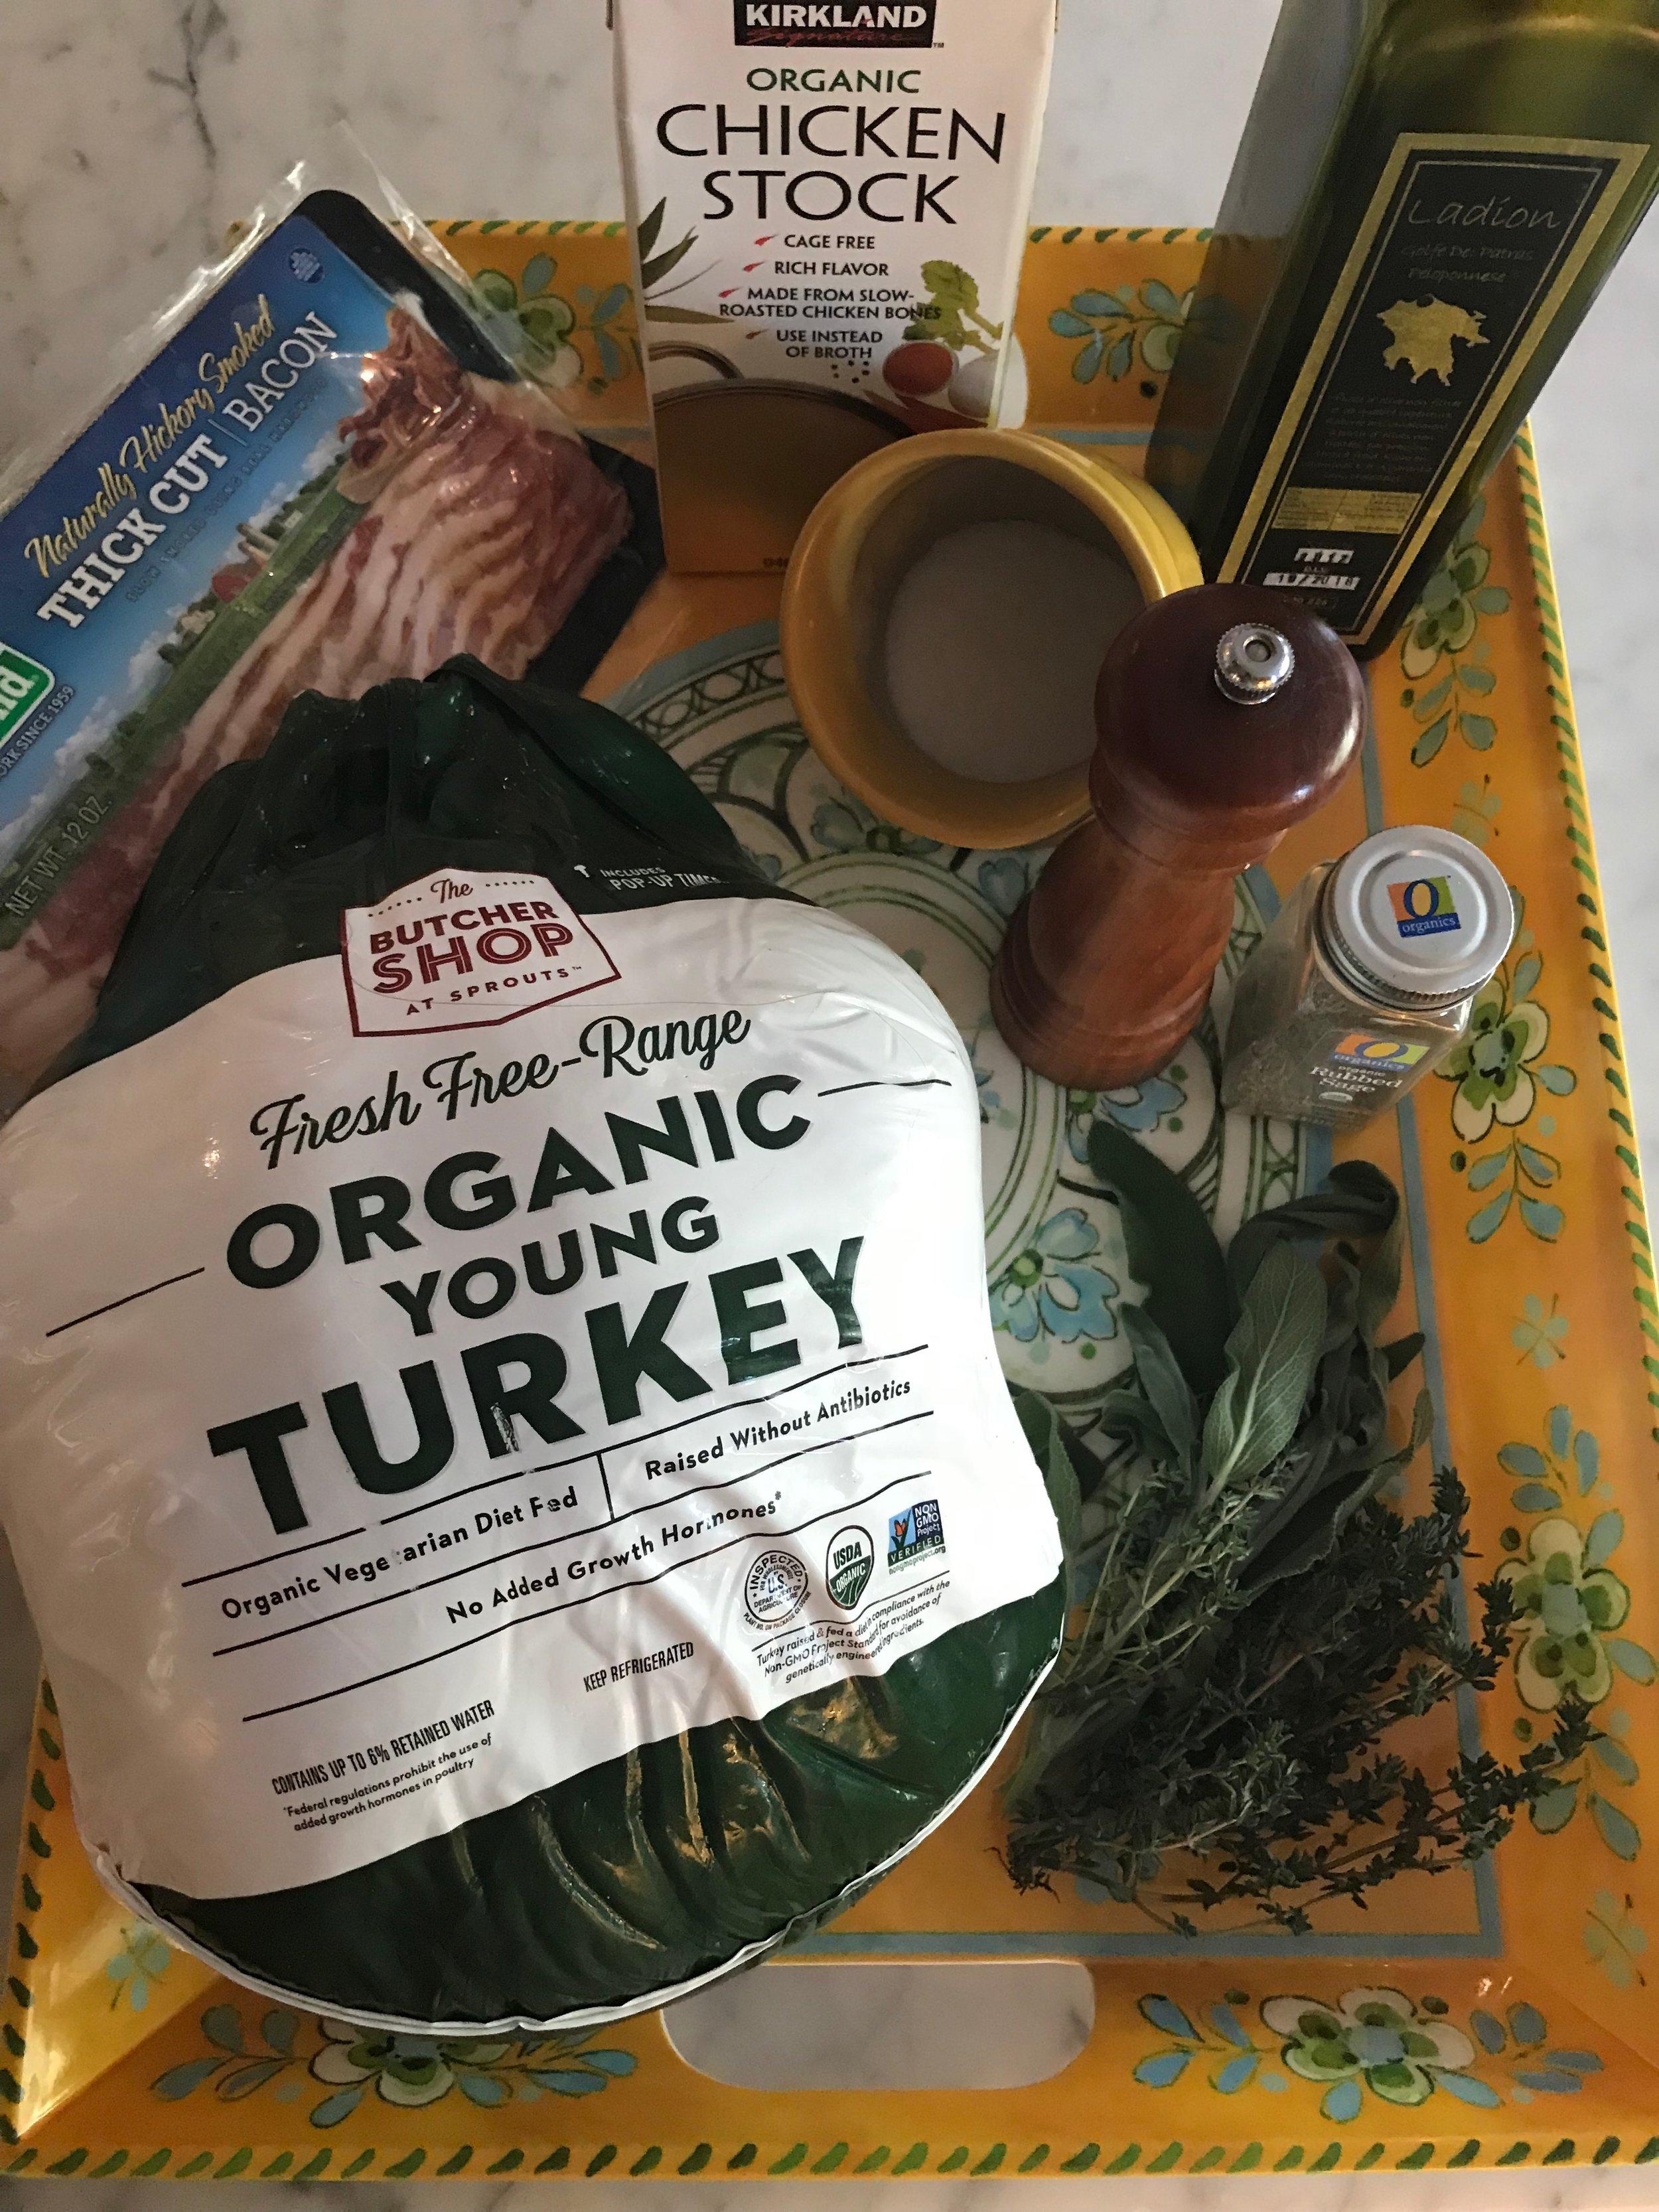 Ingredients - 1 14-16 pound turkey1T dried sage3 tsp. salt1 tsp. black pepper3 slices bacon, cut in halffresh thyme & sage leavesolive oil3 cups chicken stock